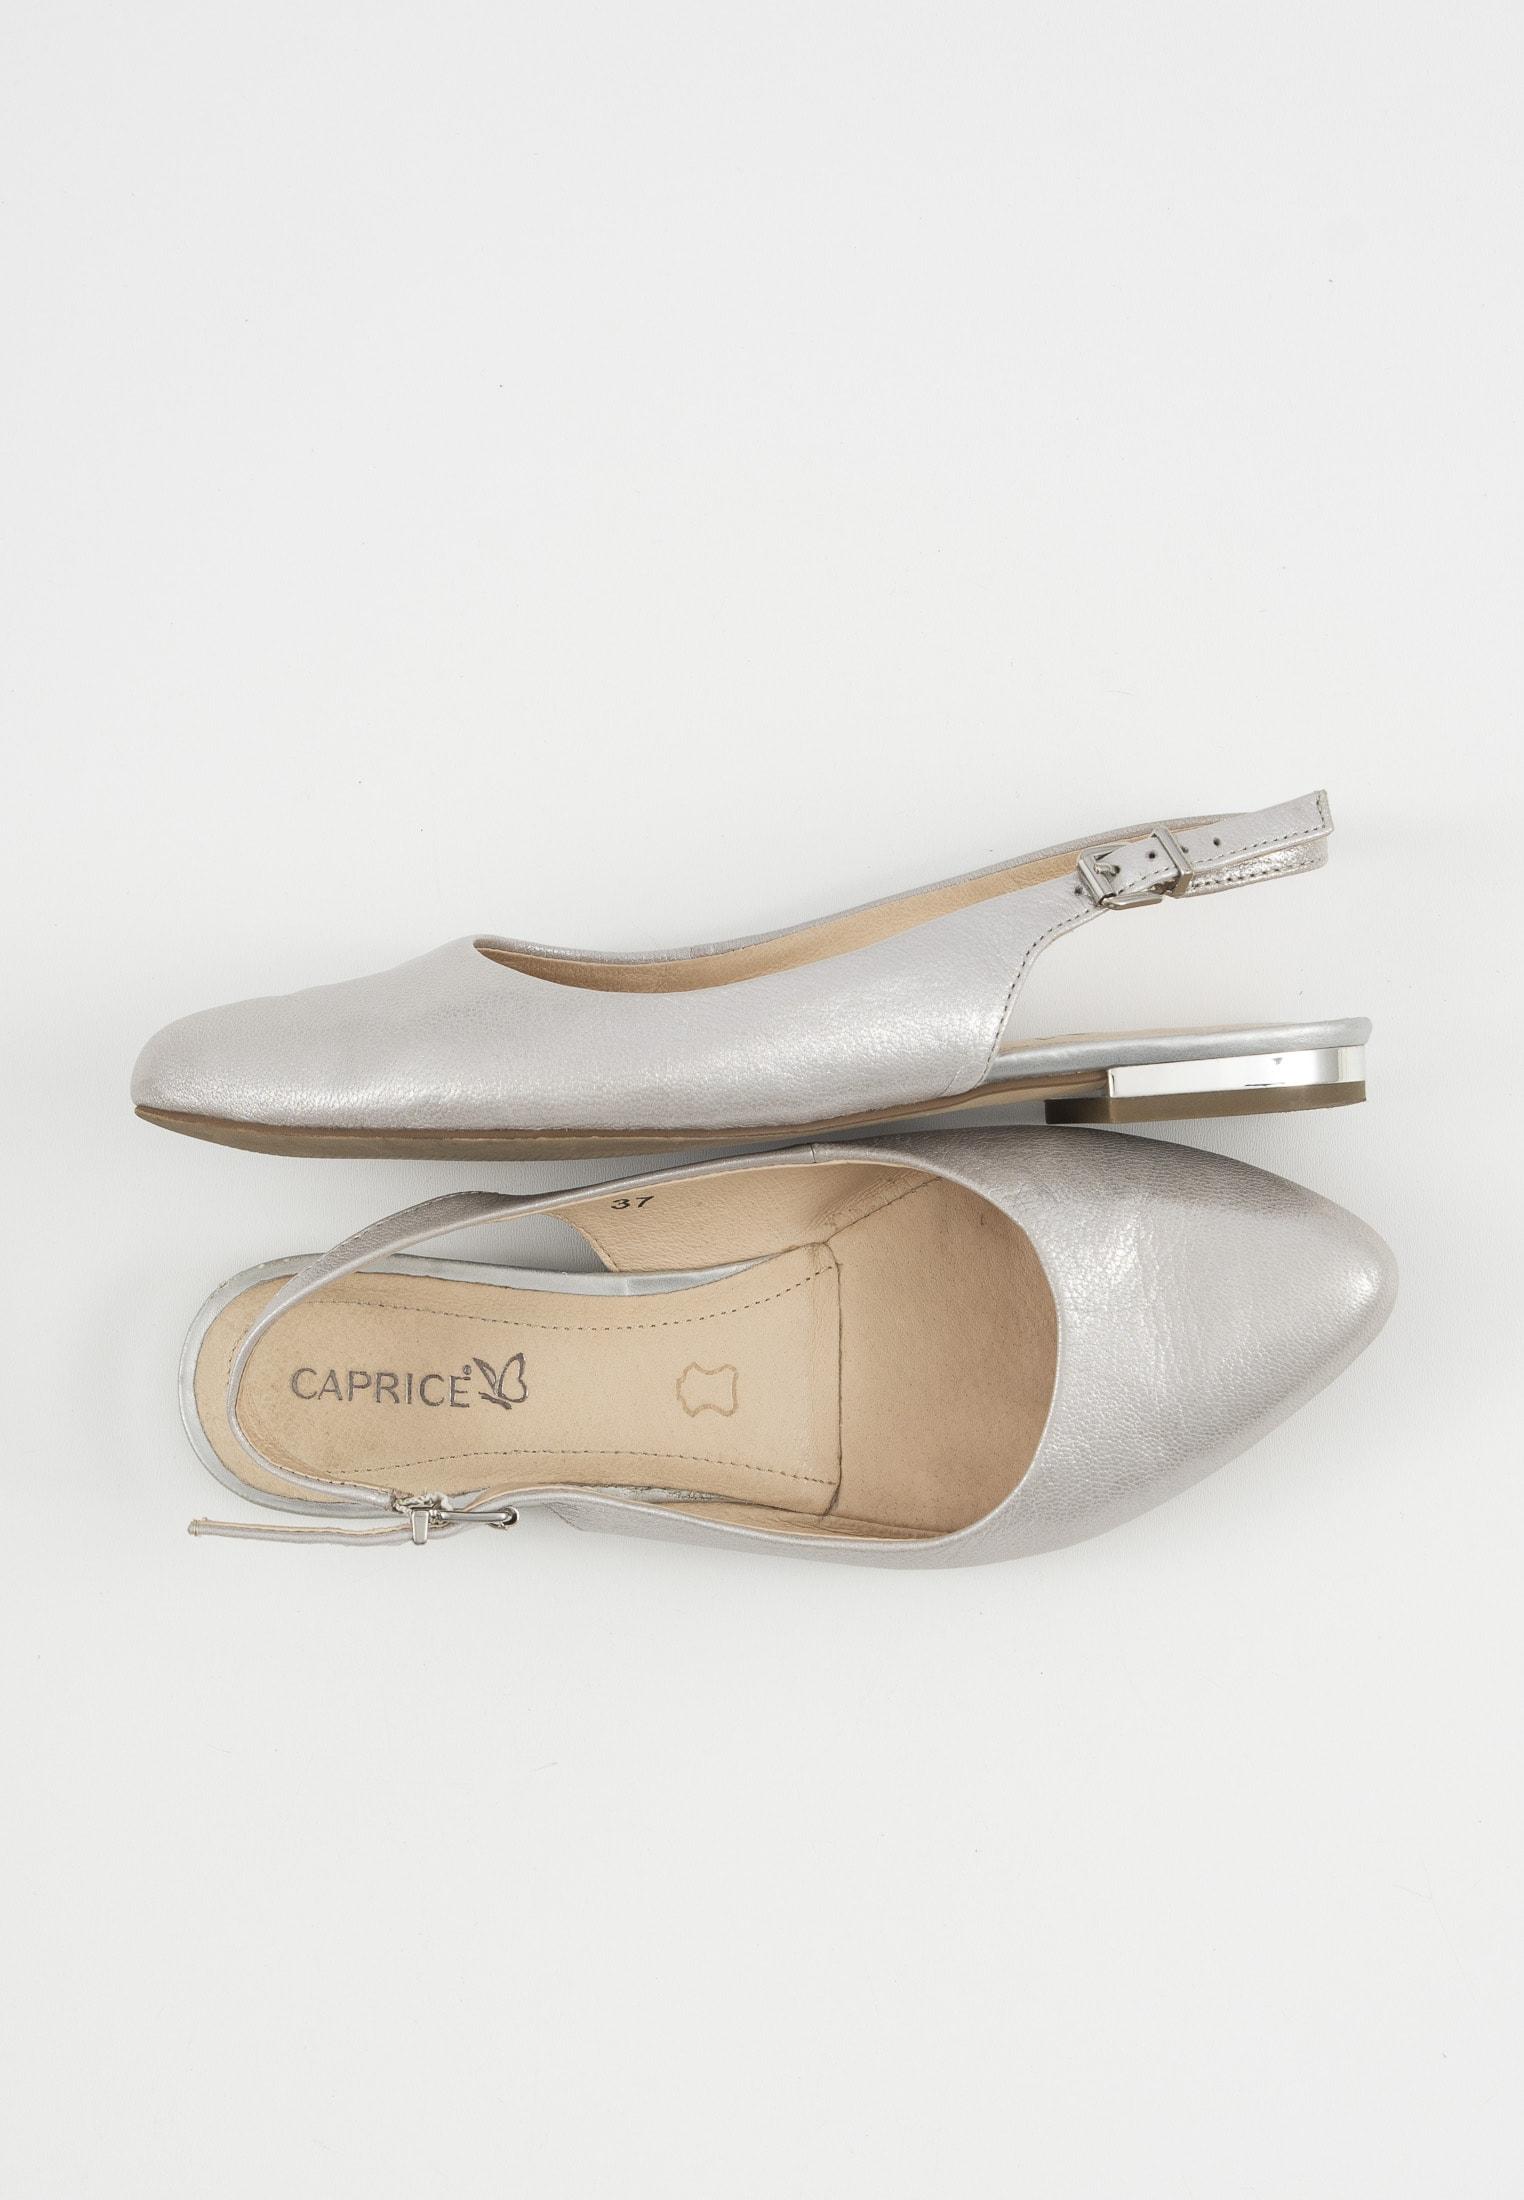 Caprice Halbschuh / Ballerina Grau Gr.37